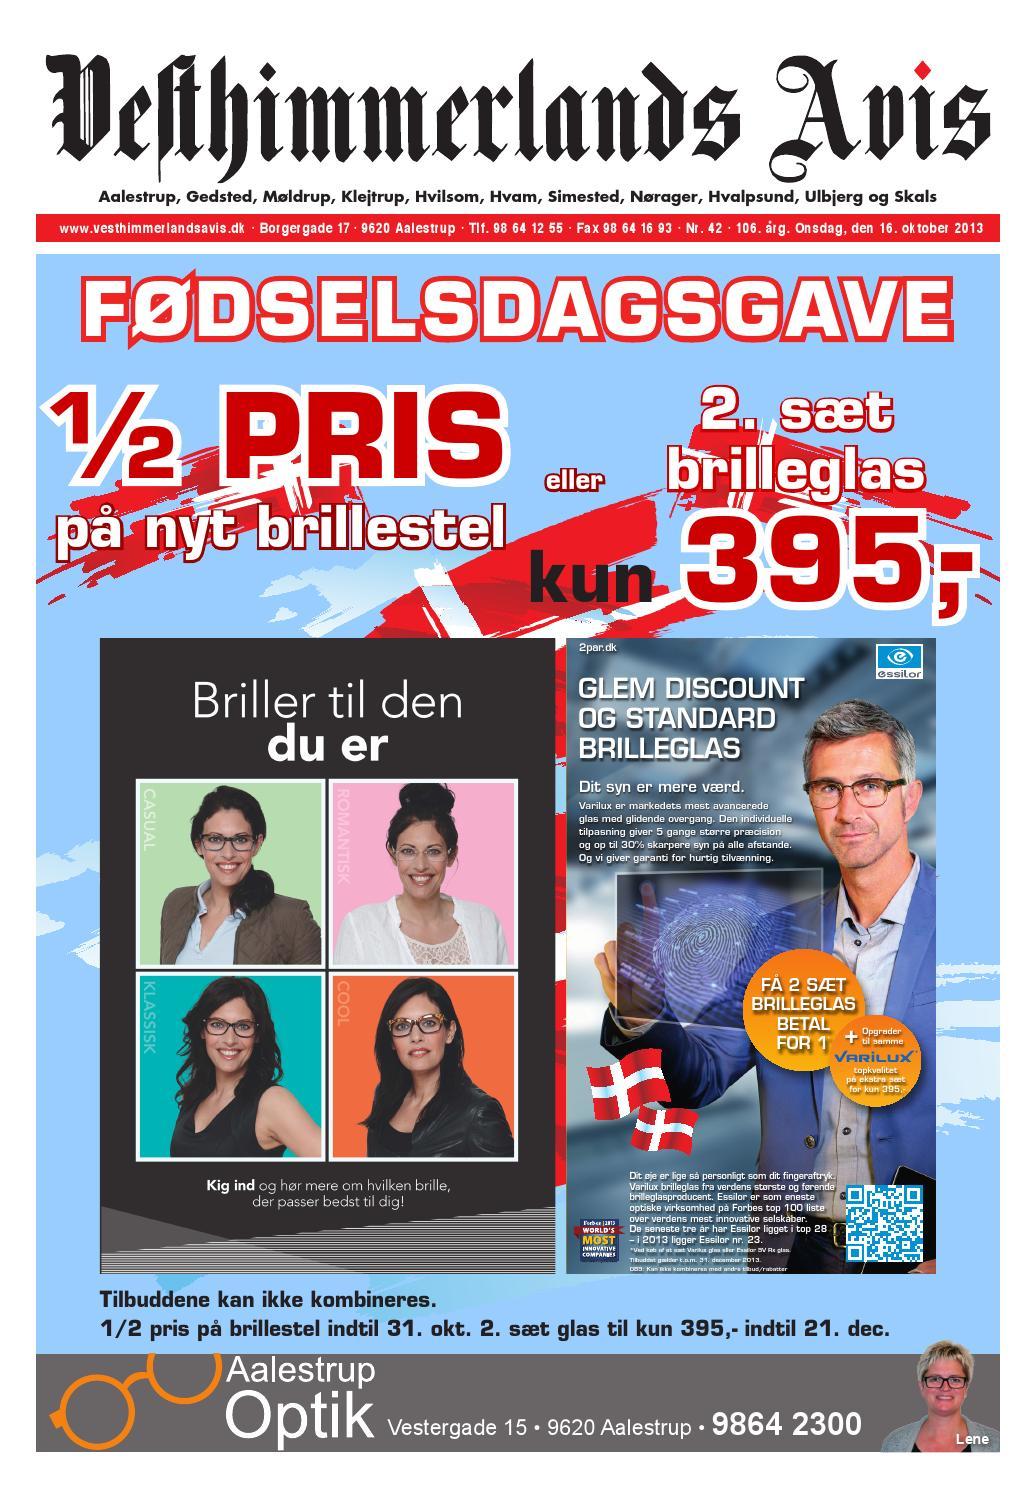 2f78c37a7a70 Vesthimmerlands Avis nr. 42 - 2013 by Vesthimmerlands Avis - issuu